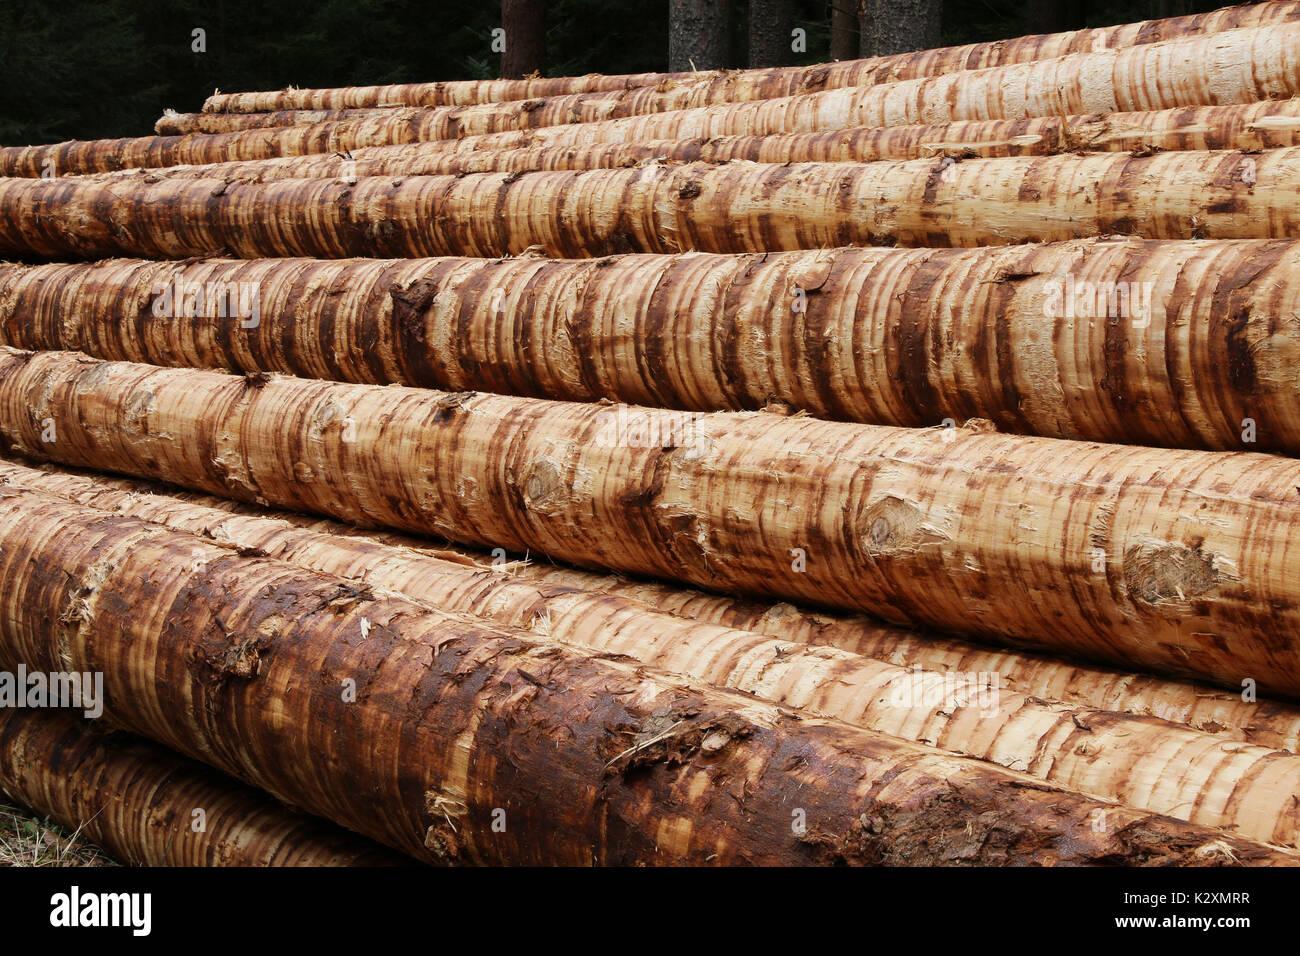 Wald, Forst, Holz, Natur, Baeume, Staemme, entrindet, Rohstoff, nachwachsend Stock Photo